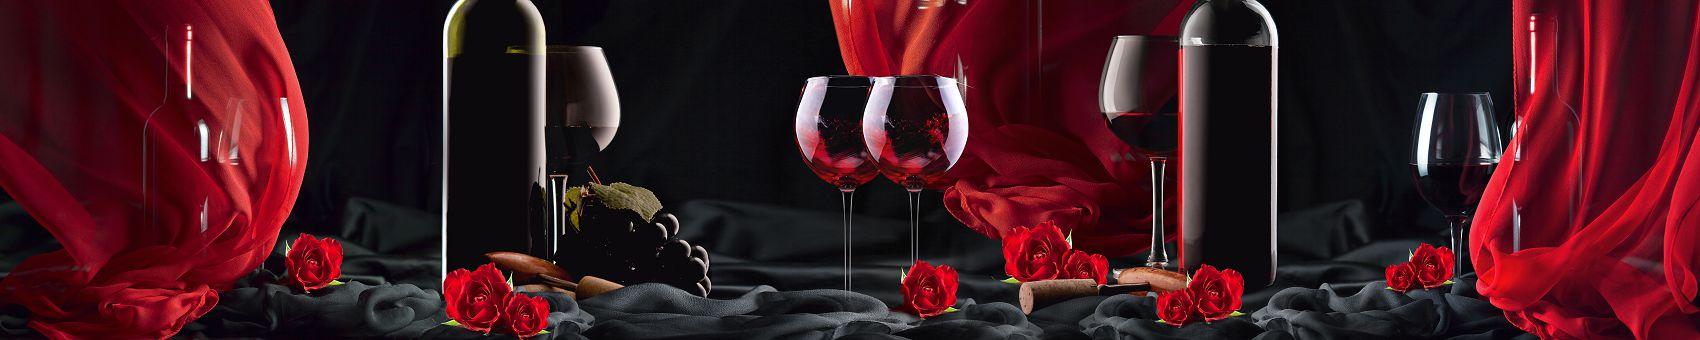 Кухонный фартук вино на черном фоне